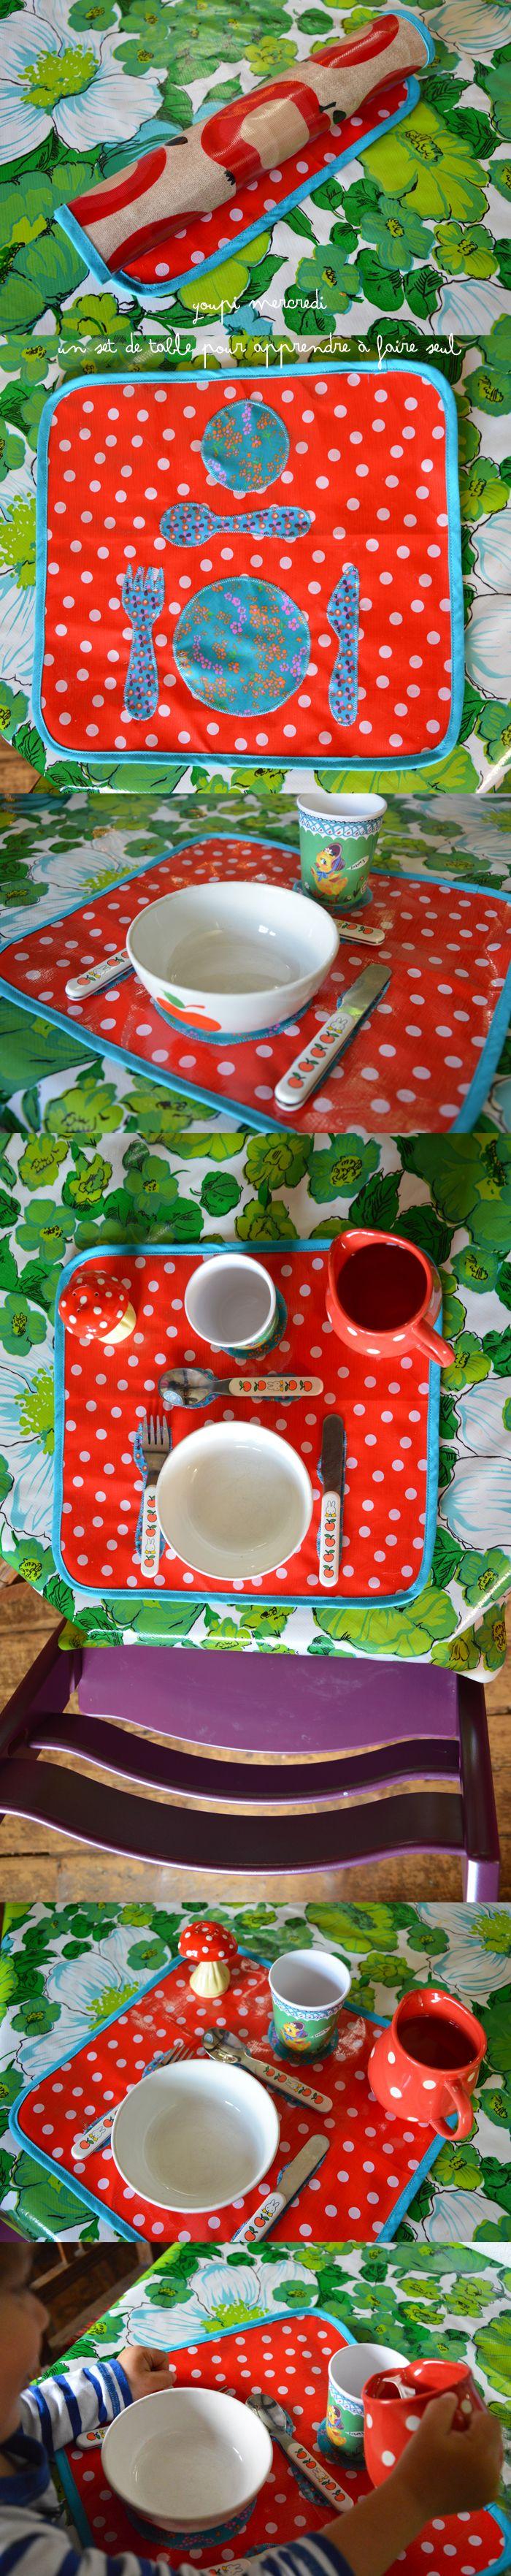 Apprendre à mettre la table seul - Youpi mercredi #20 : le set de table « Blisscocotte